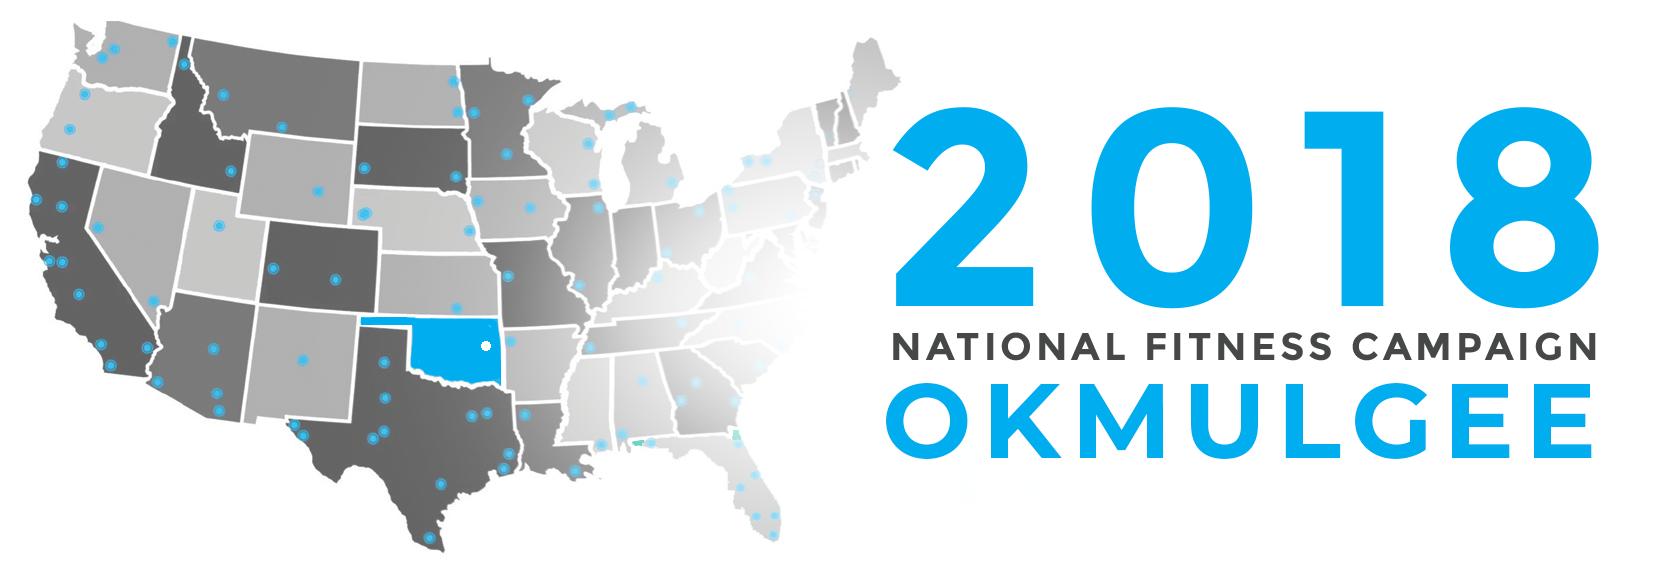 2018 Campaign Logo Okmulgee.png